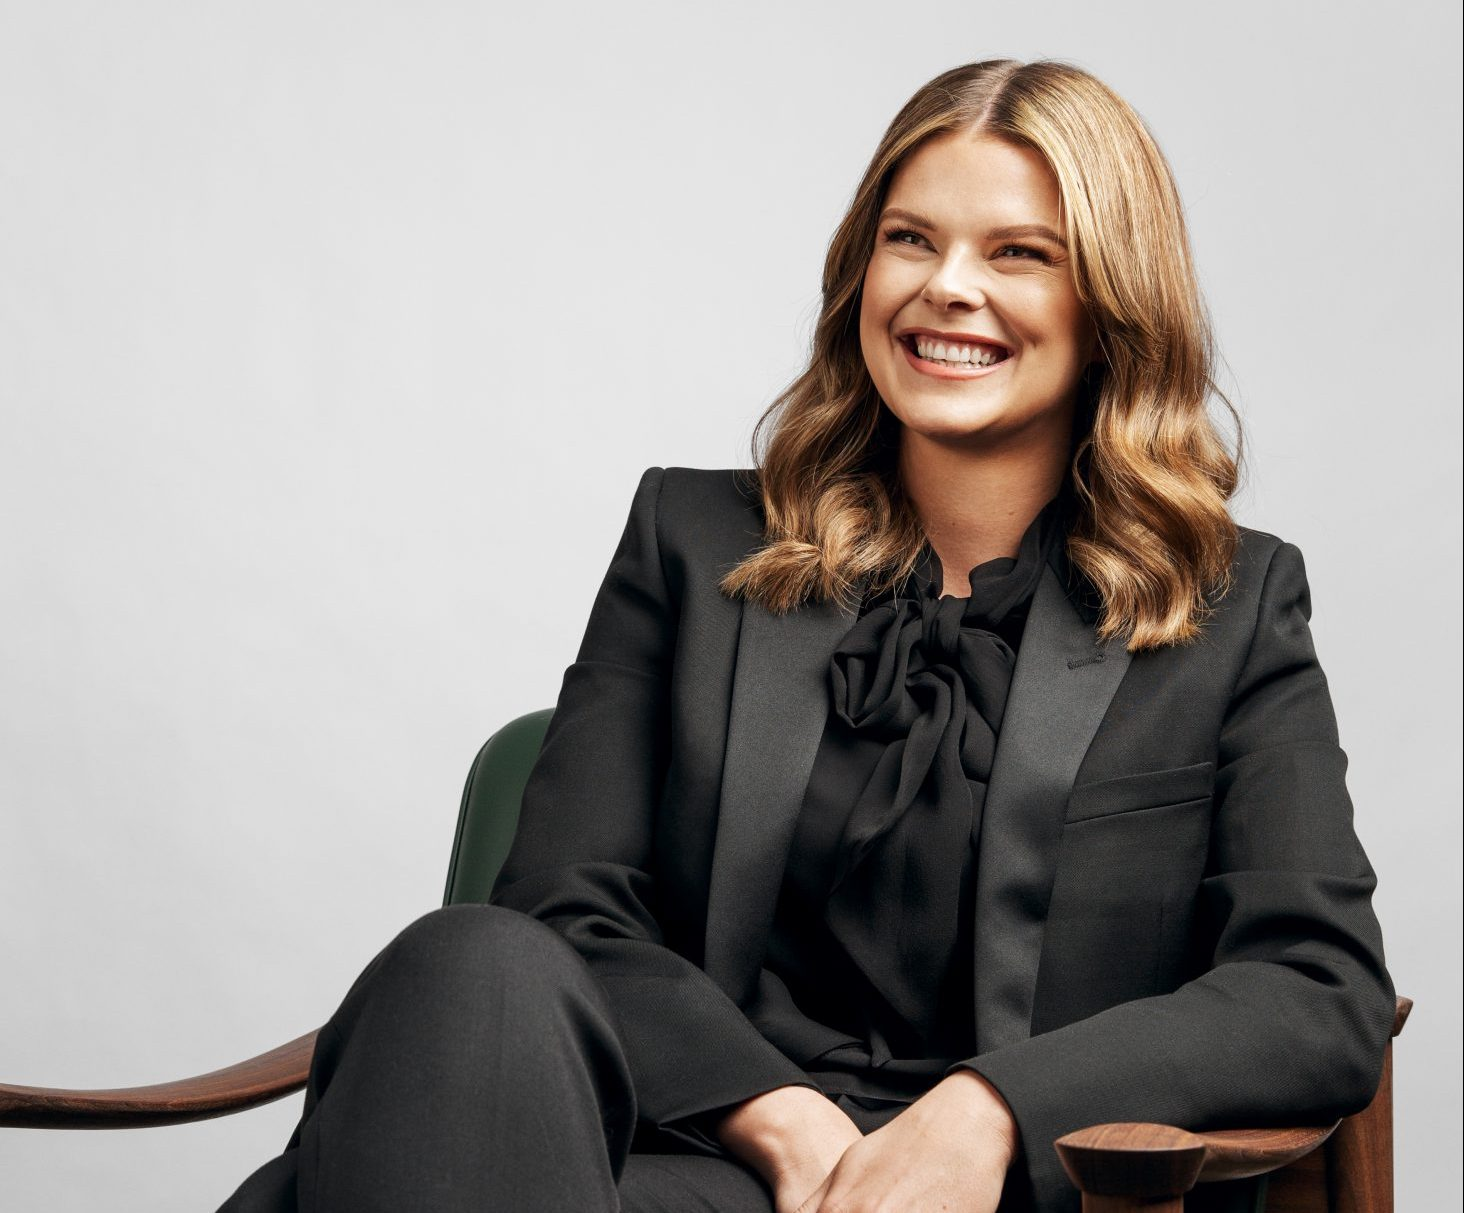 Linnea Kornehead sitting on chair smiling